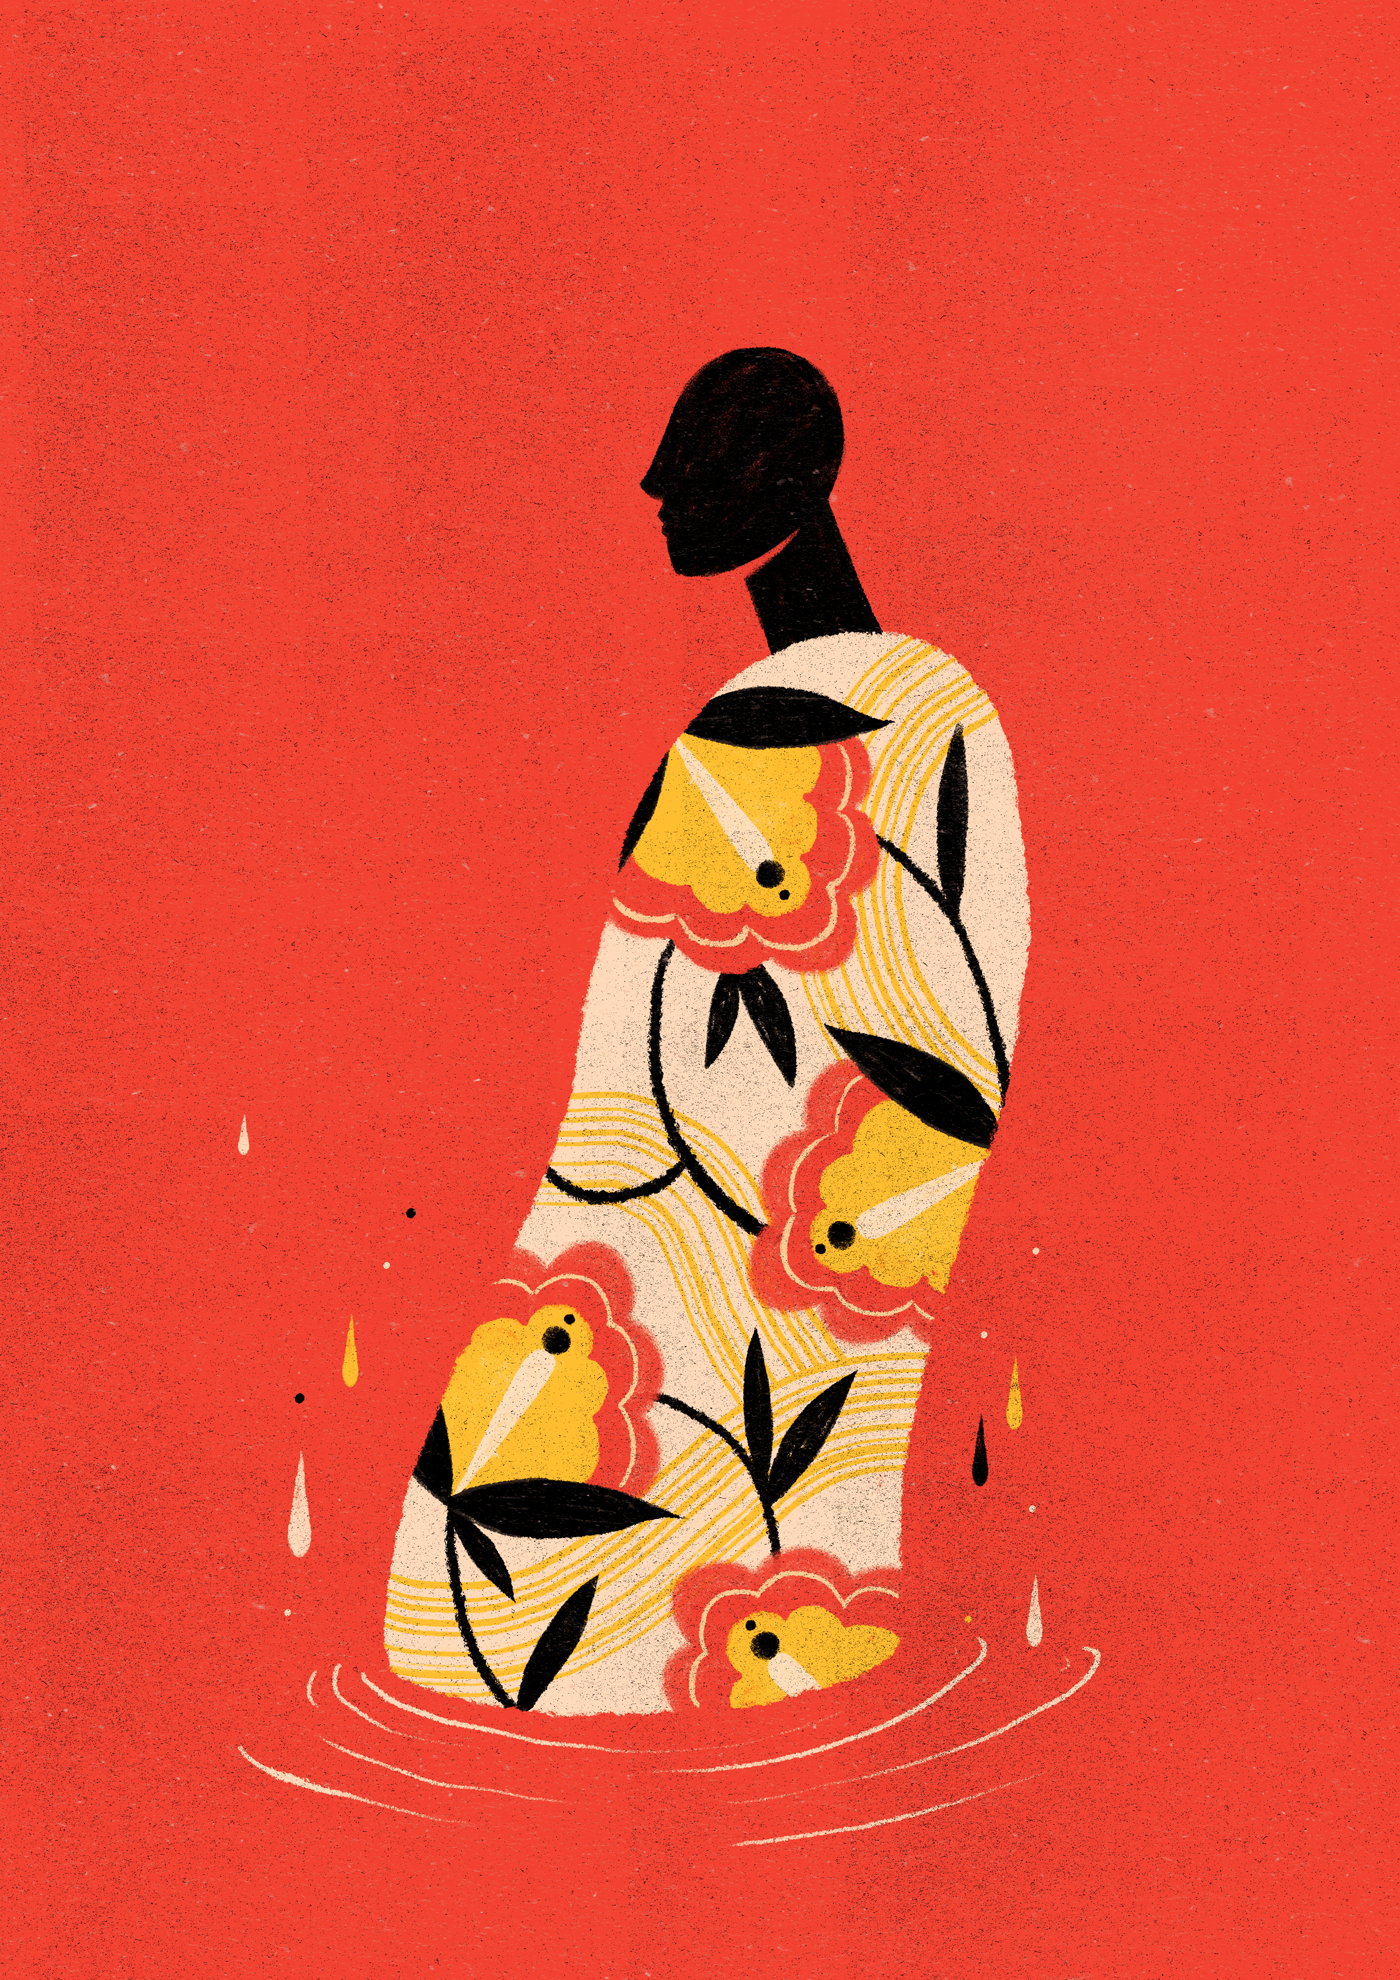 Graphic Design - Illustration - Digital Art